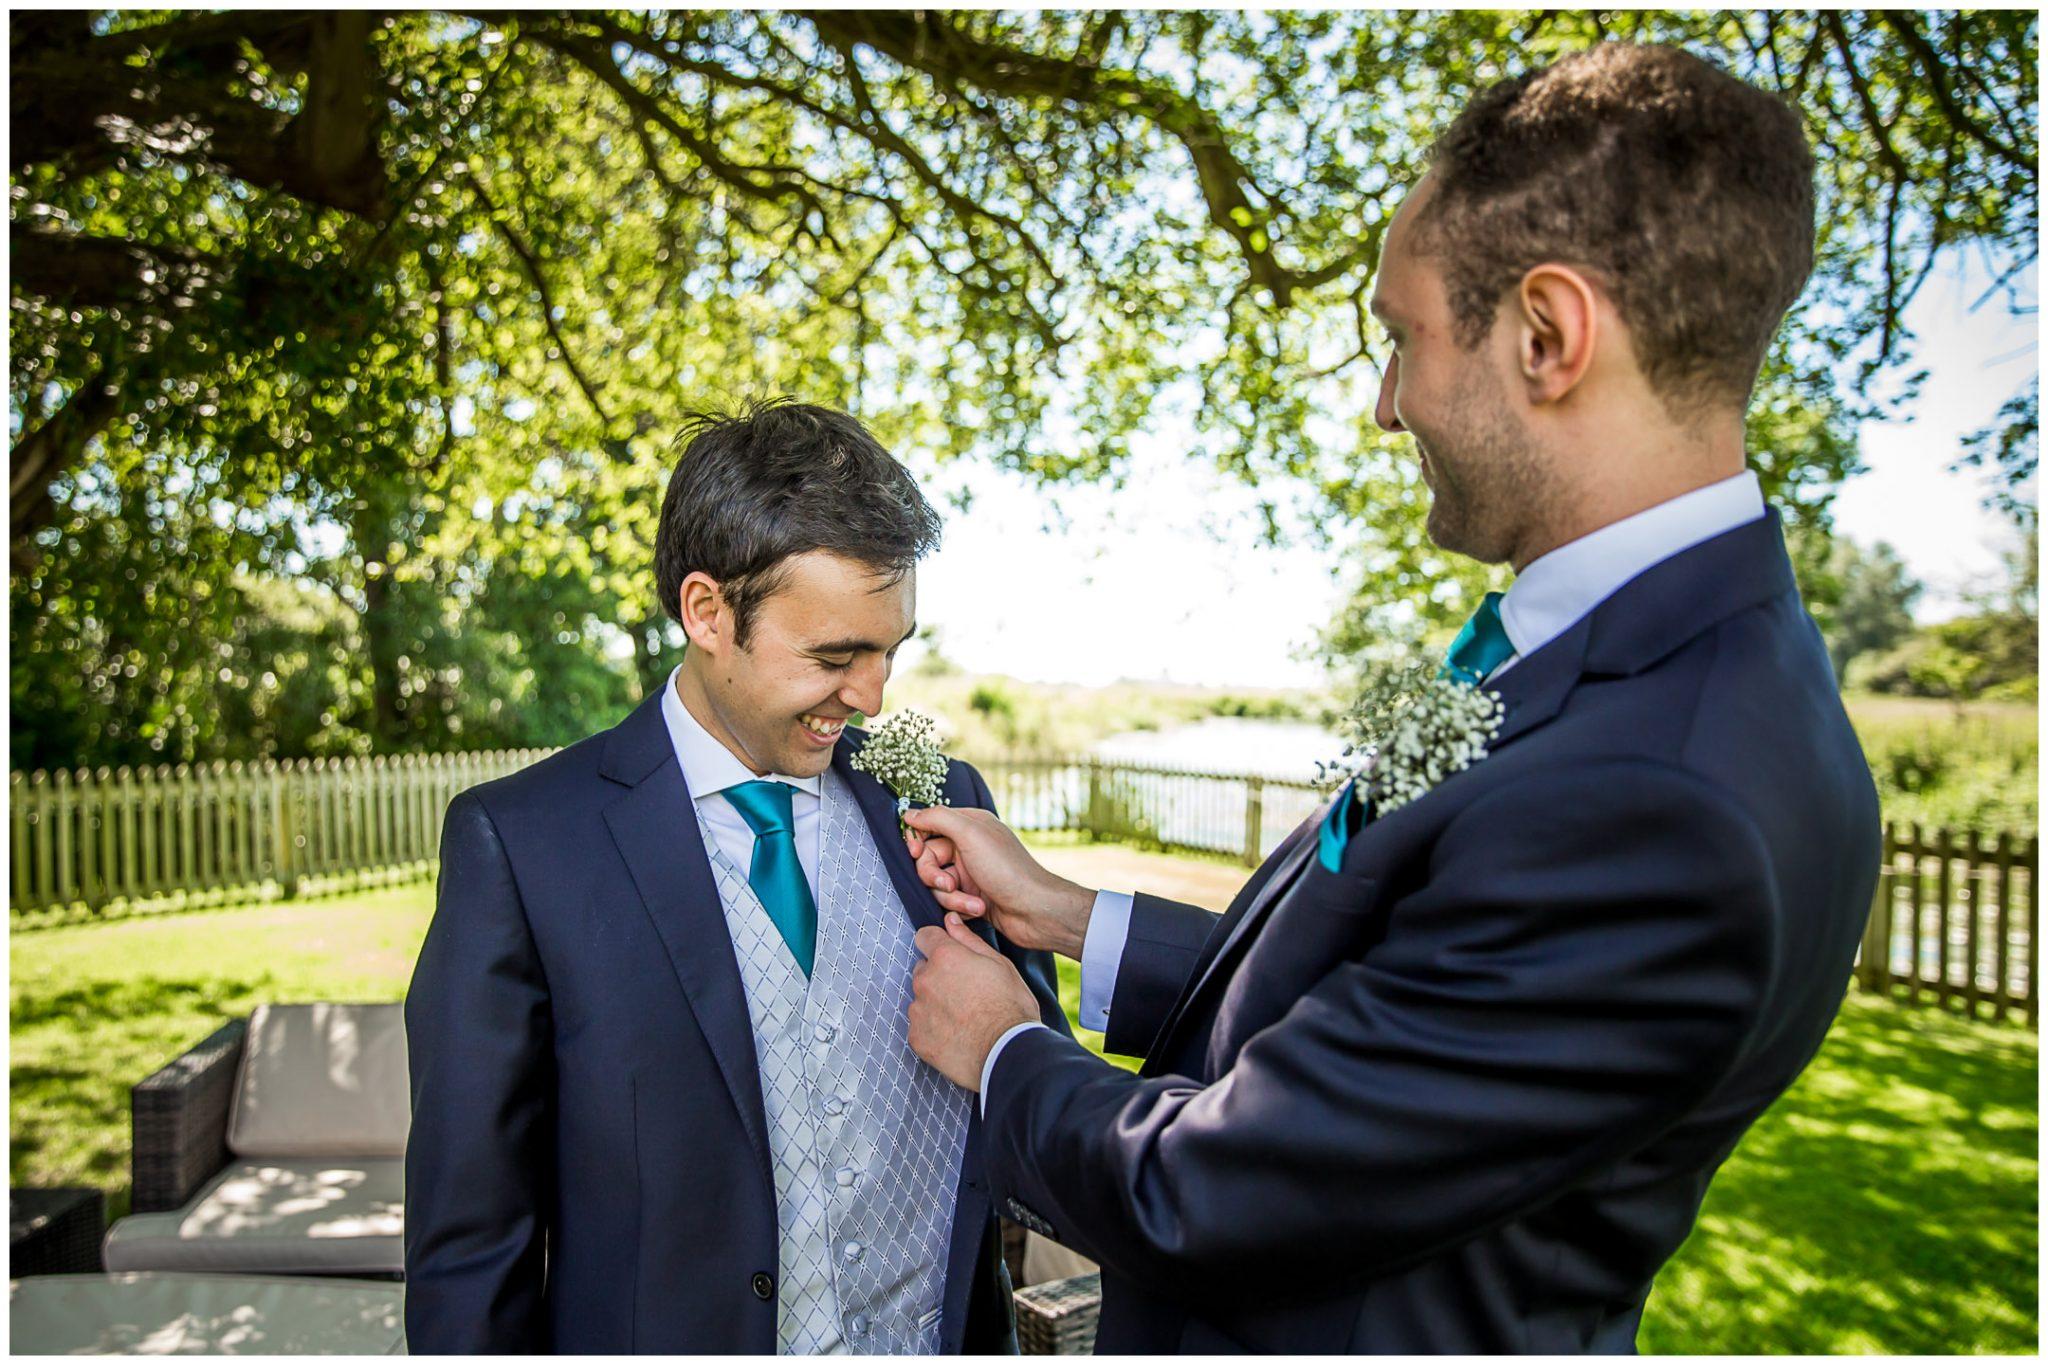 Sopley Mill Summer wedding groom with best man in gardens